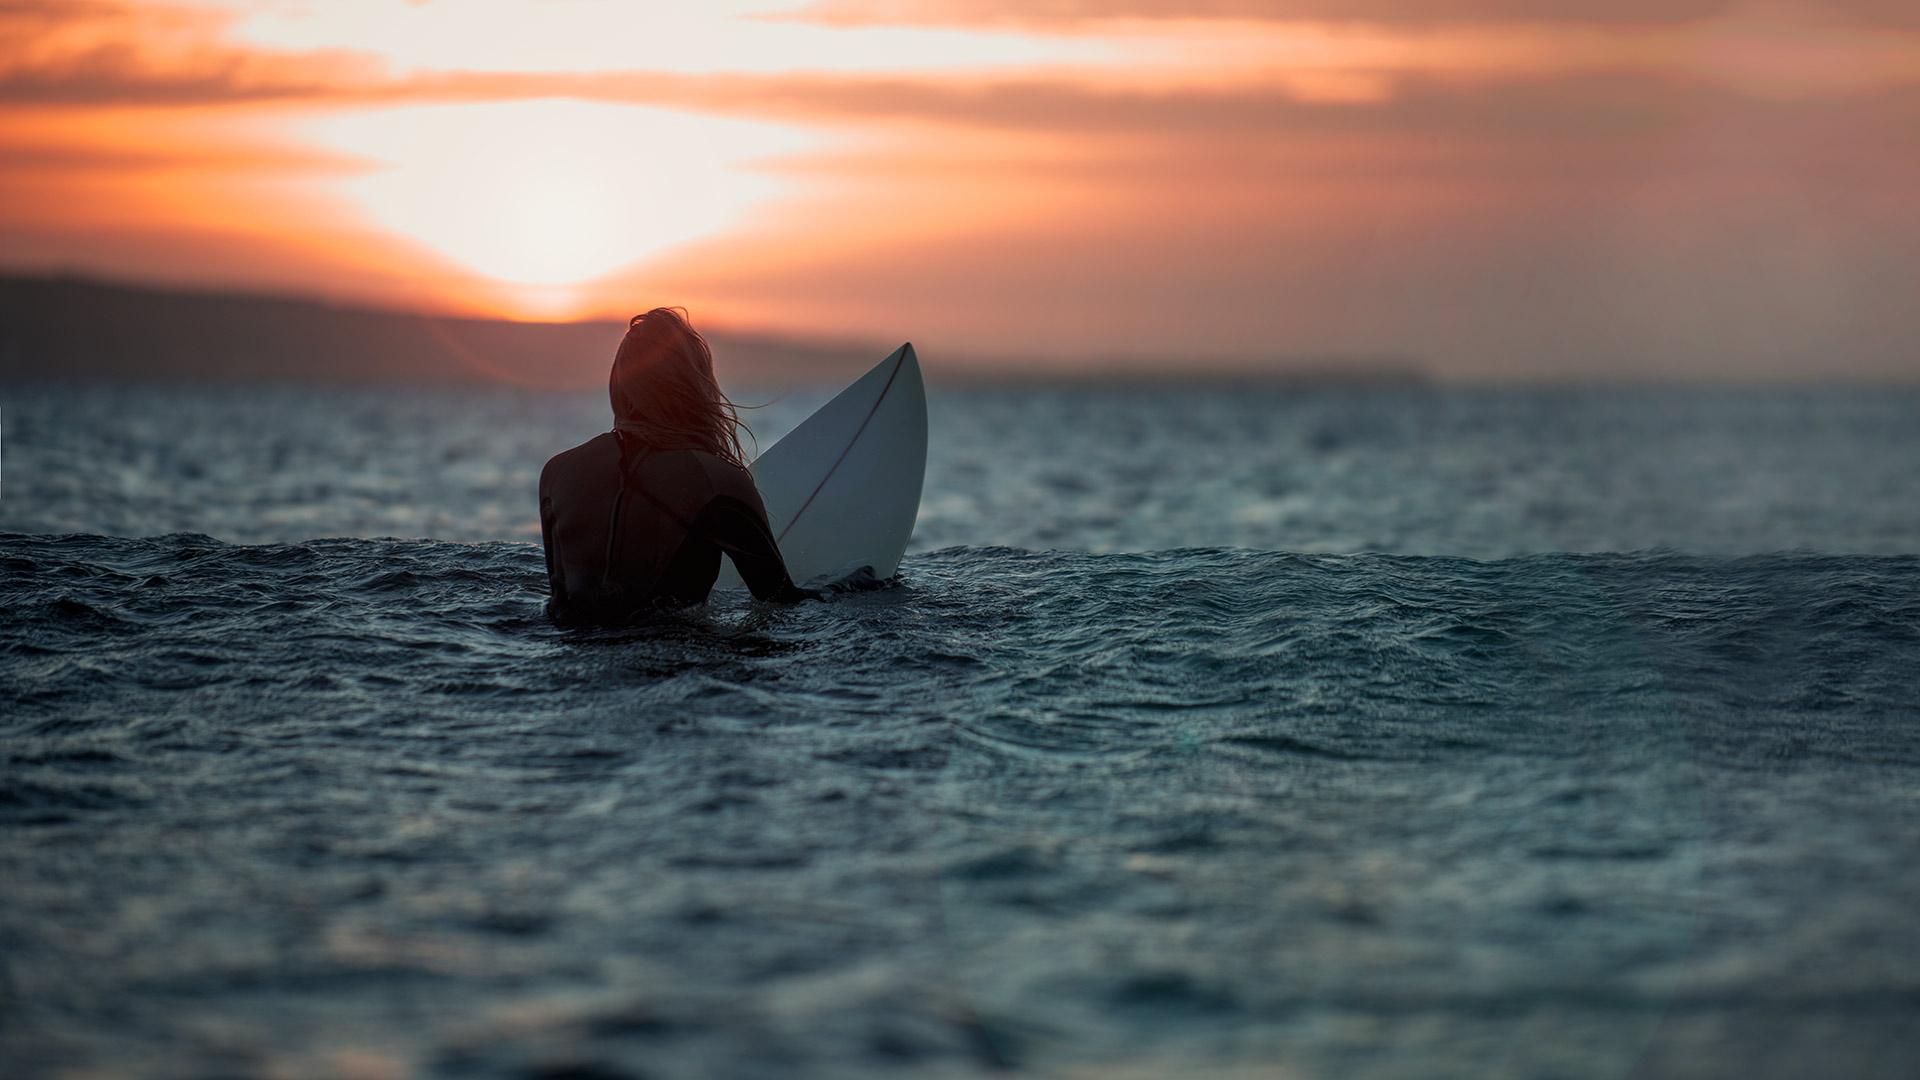 Surf_lifestyle_photography_brendon_tyree_uk_photographer